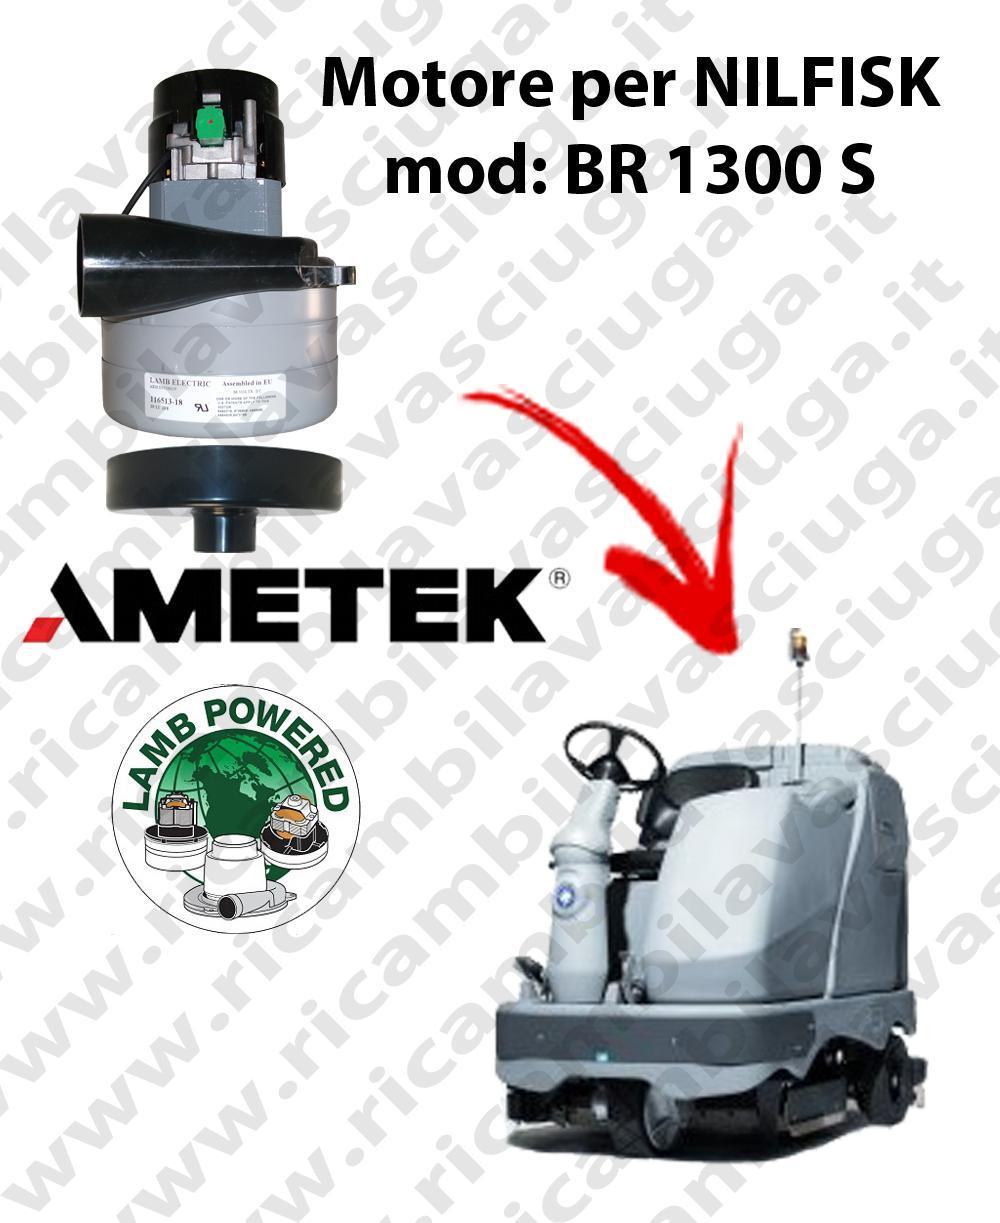 BR 1300 S Vacuum motor LAMB AMETEK for scrubber dryer NILFISK